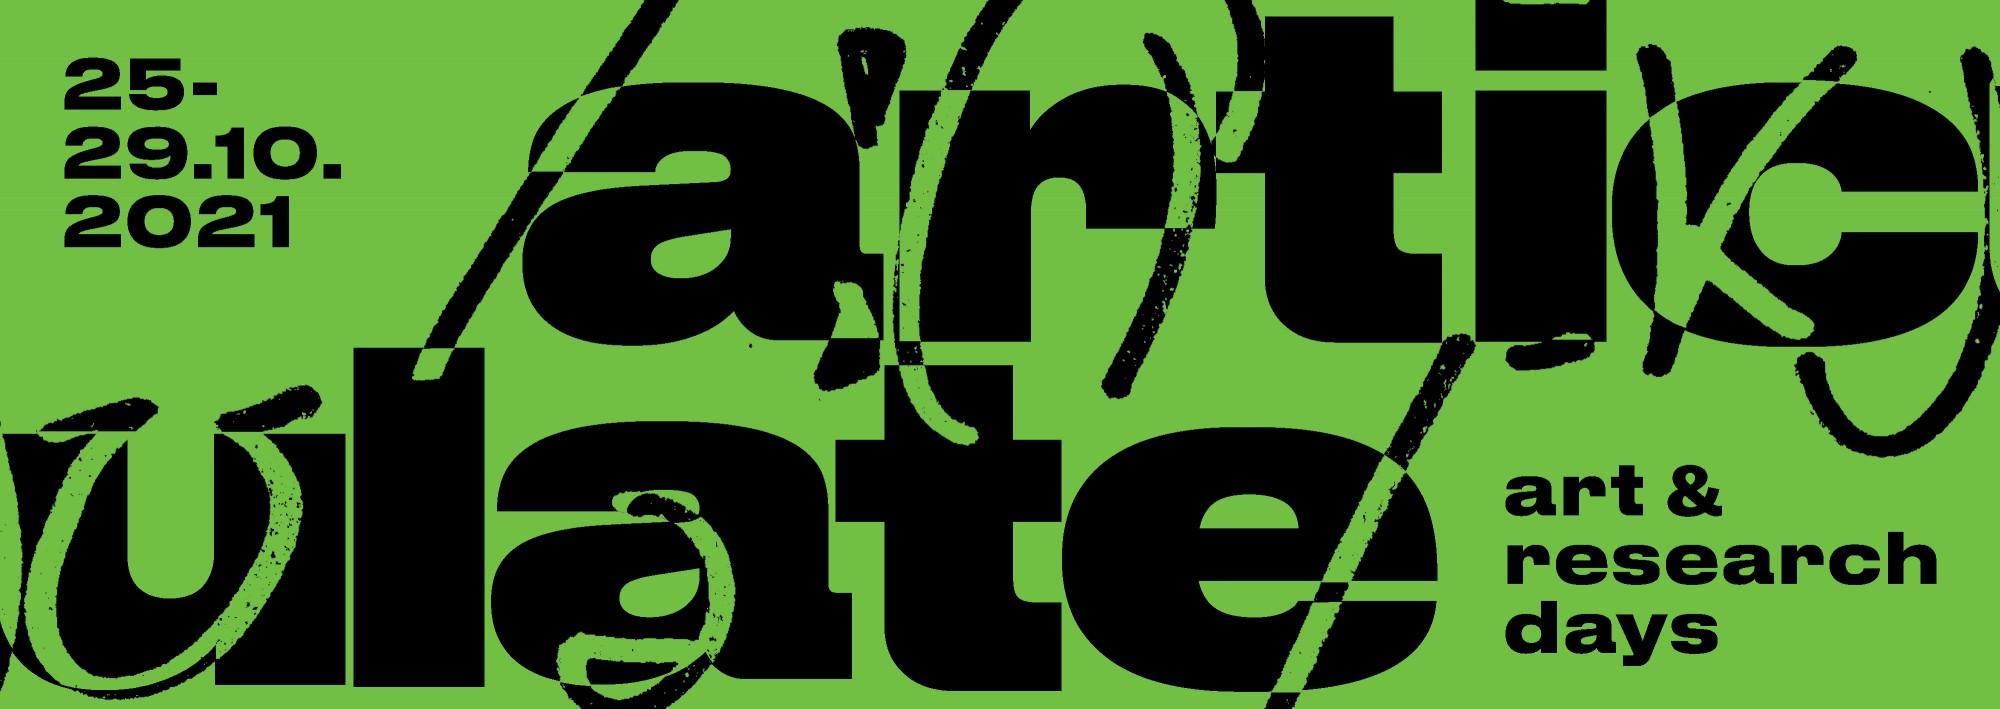 Articulate art & research days